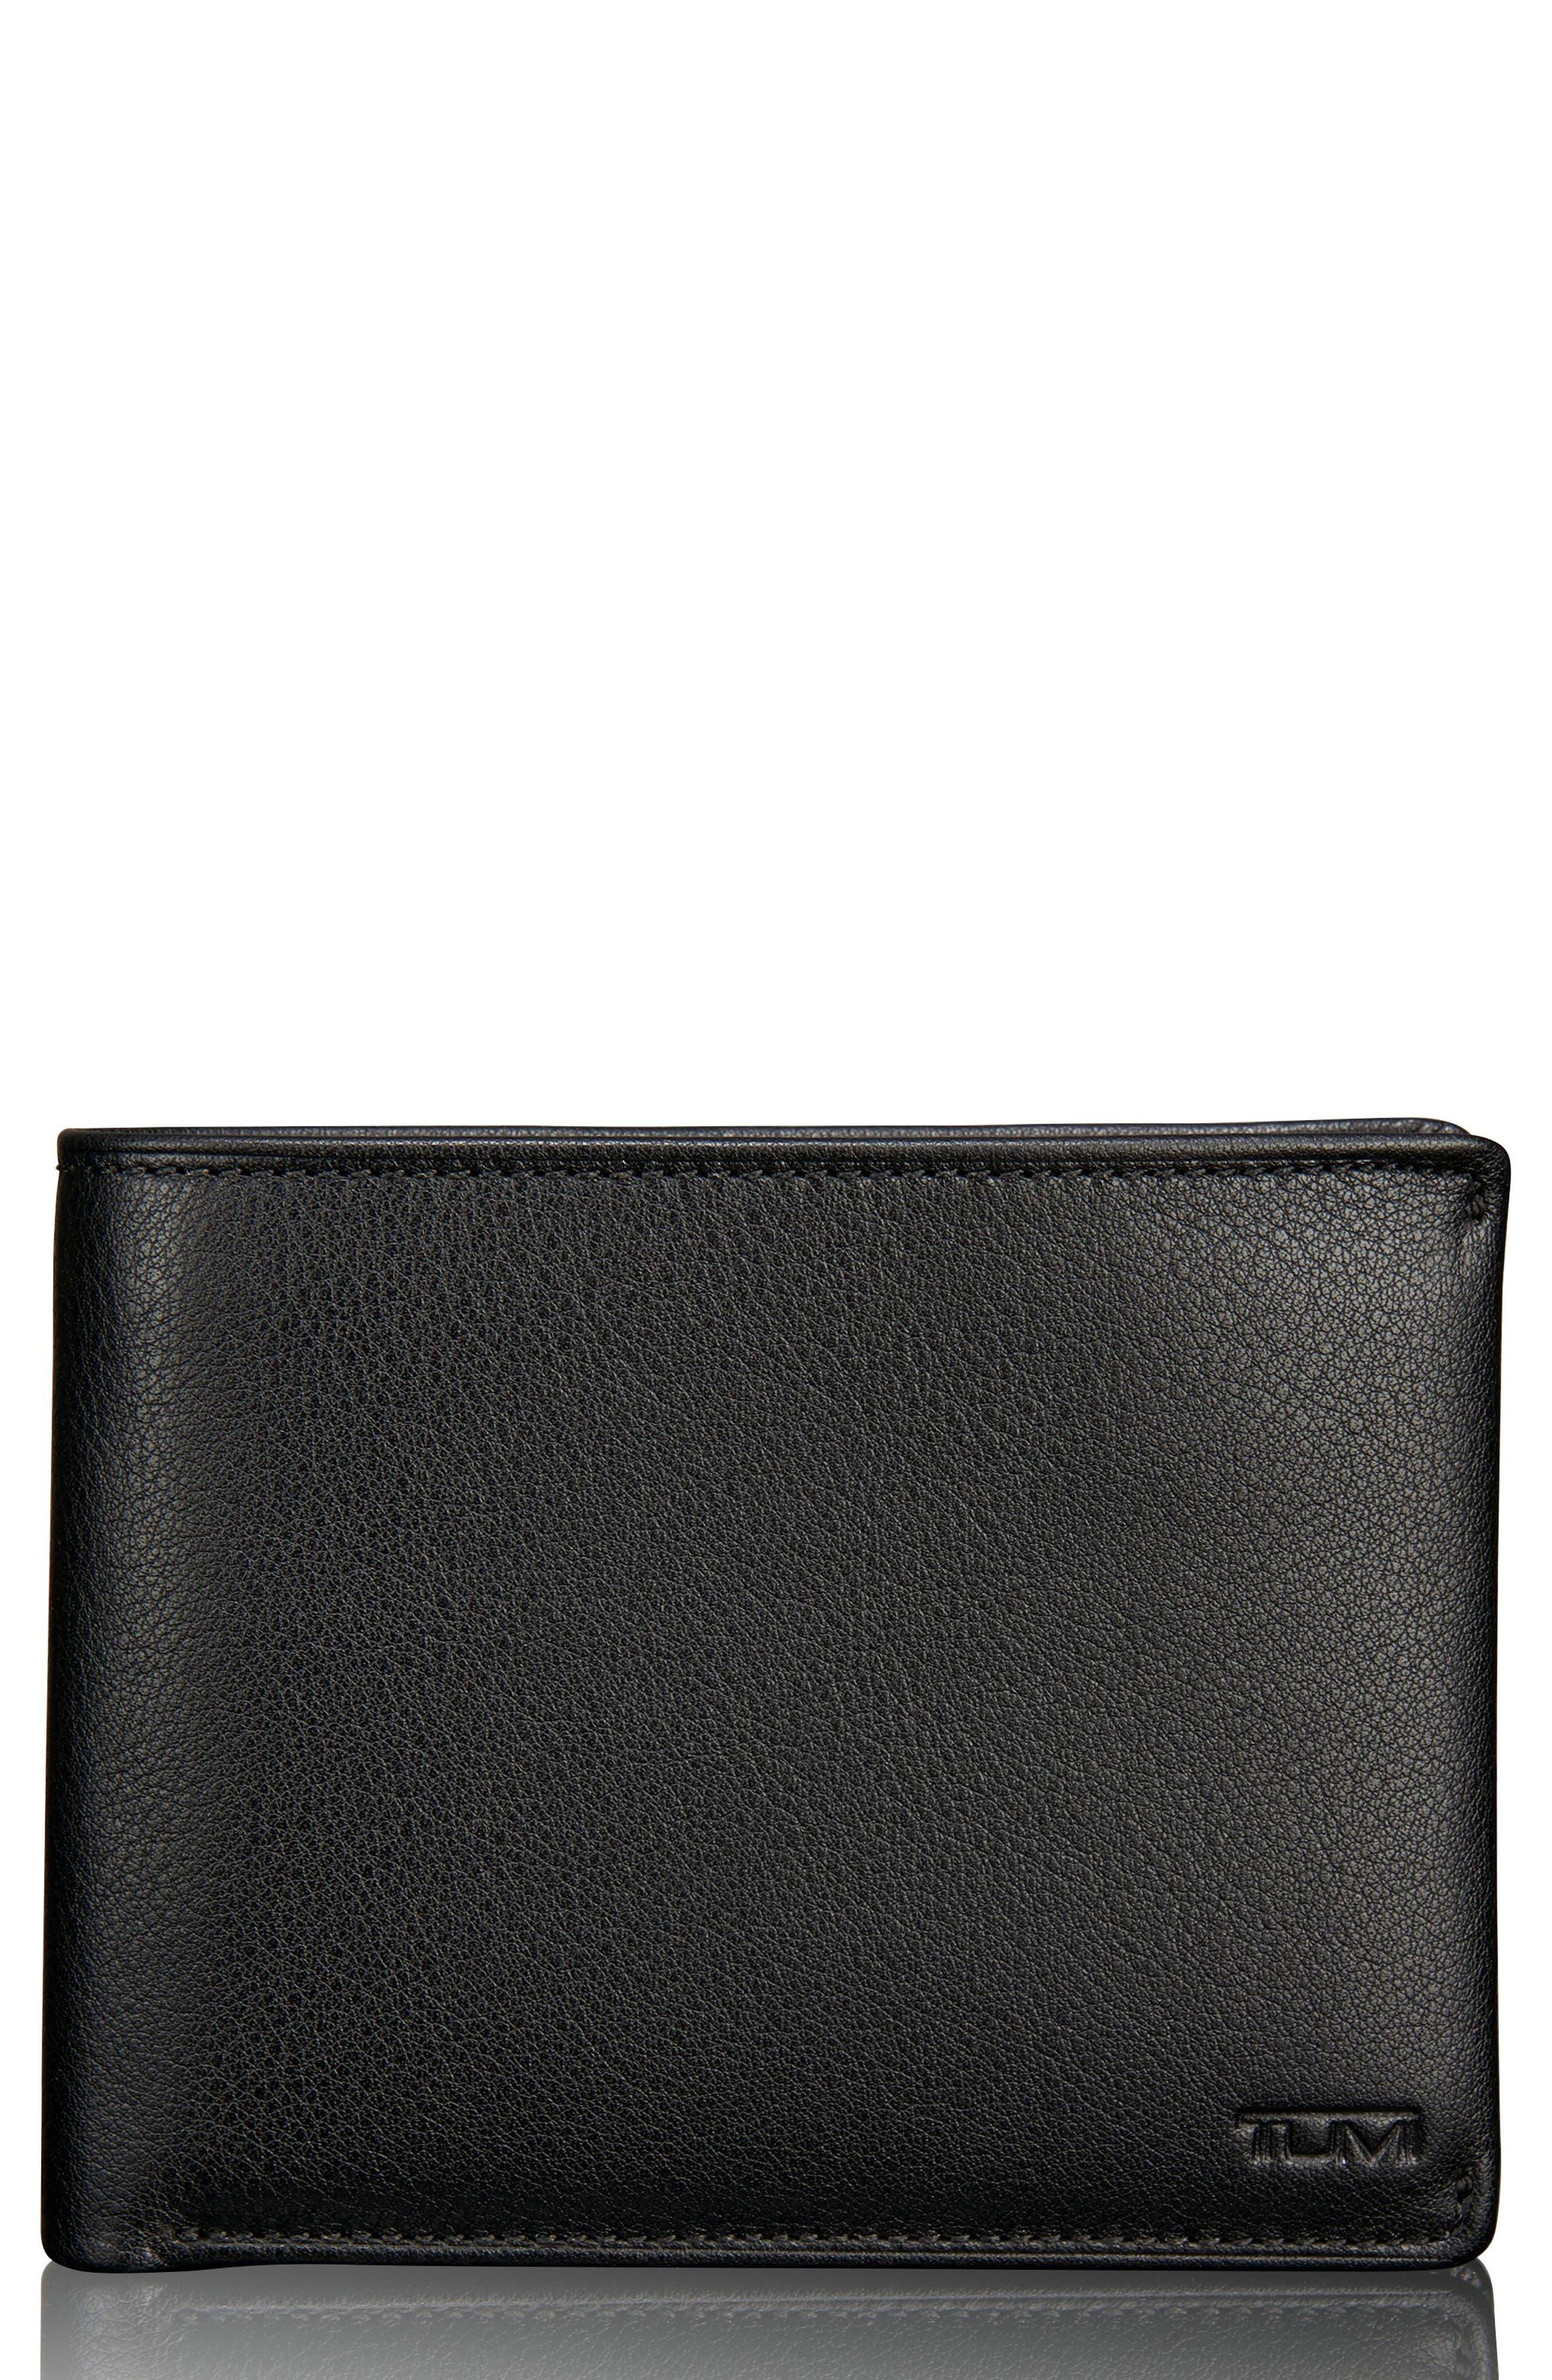 Global Passcase Wallet,                         Main,                         color, 011